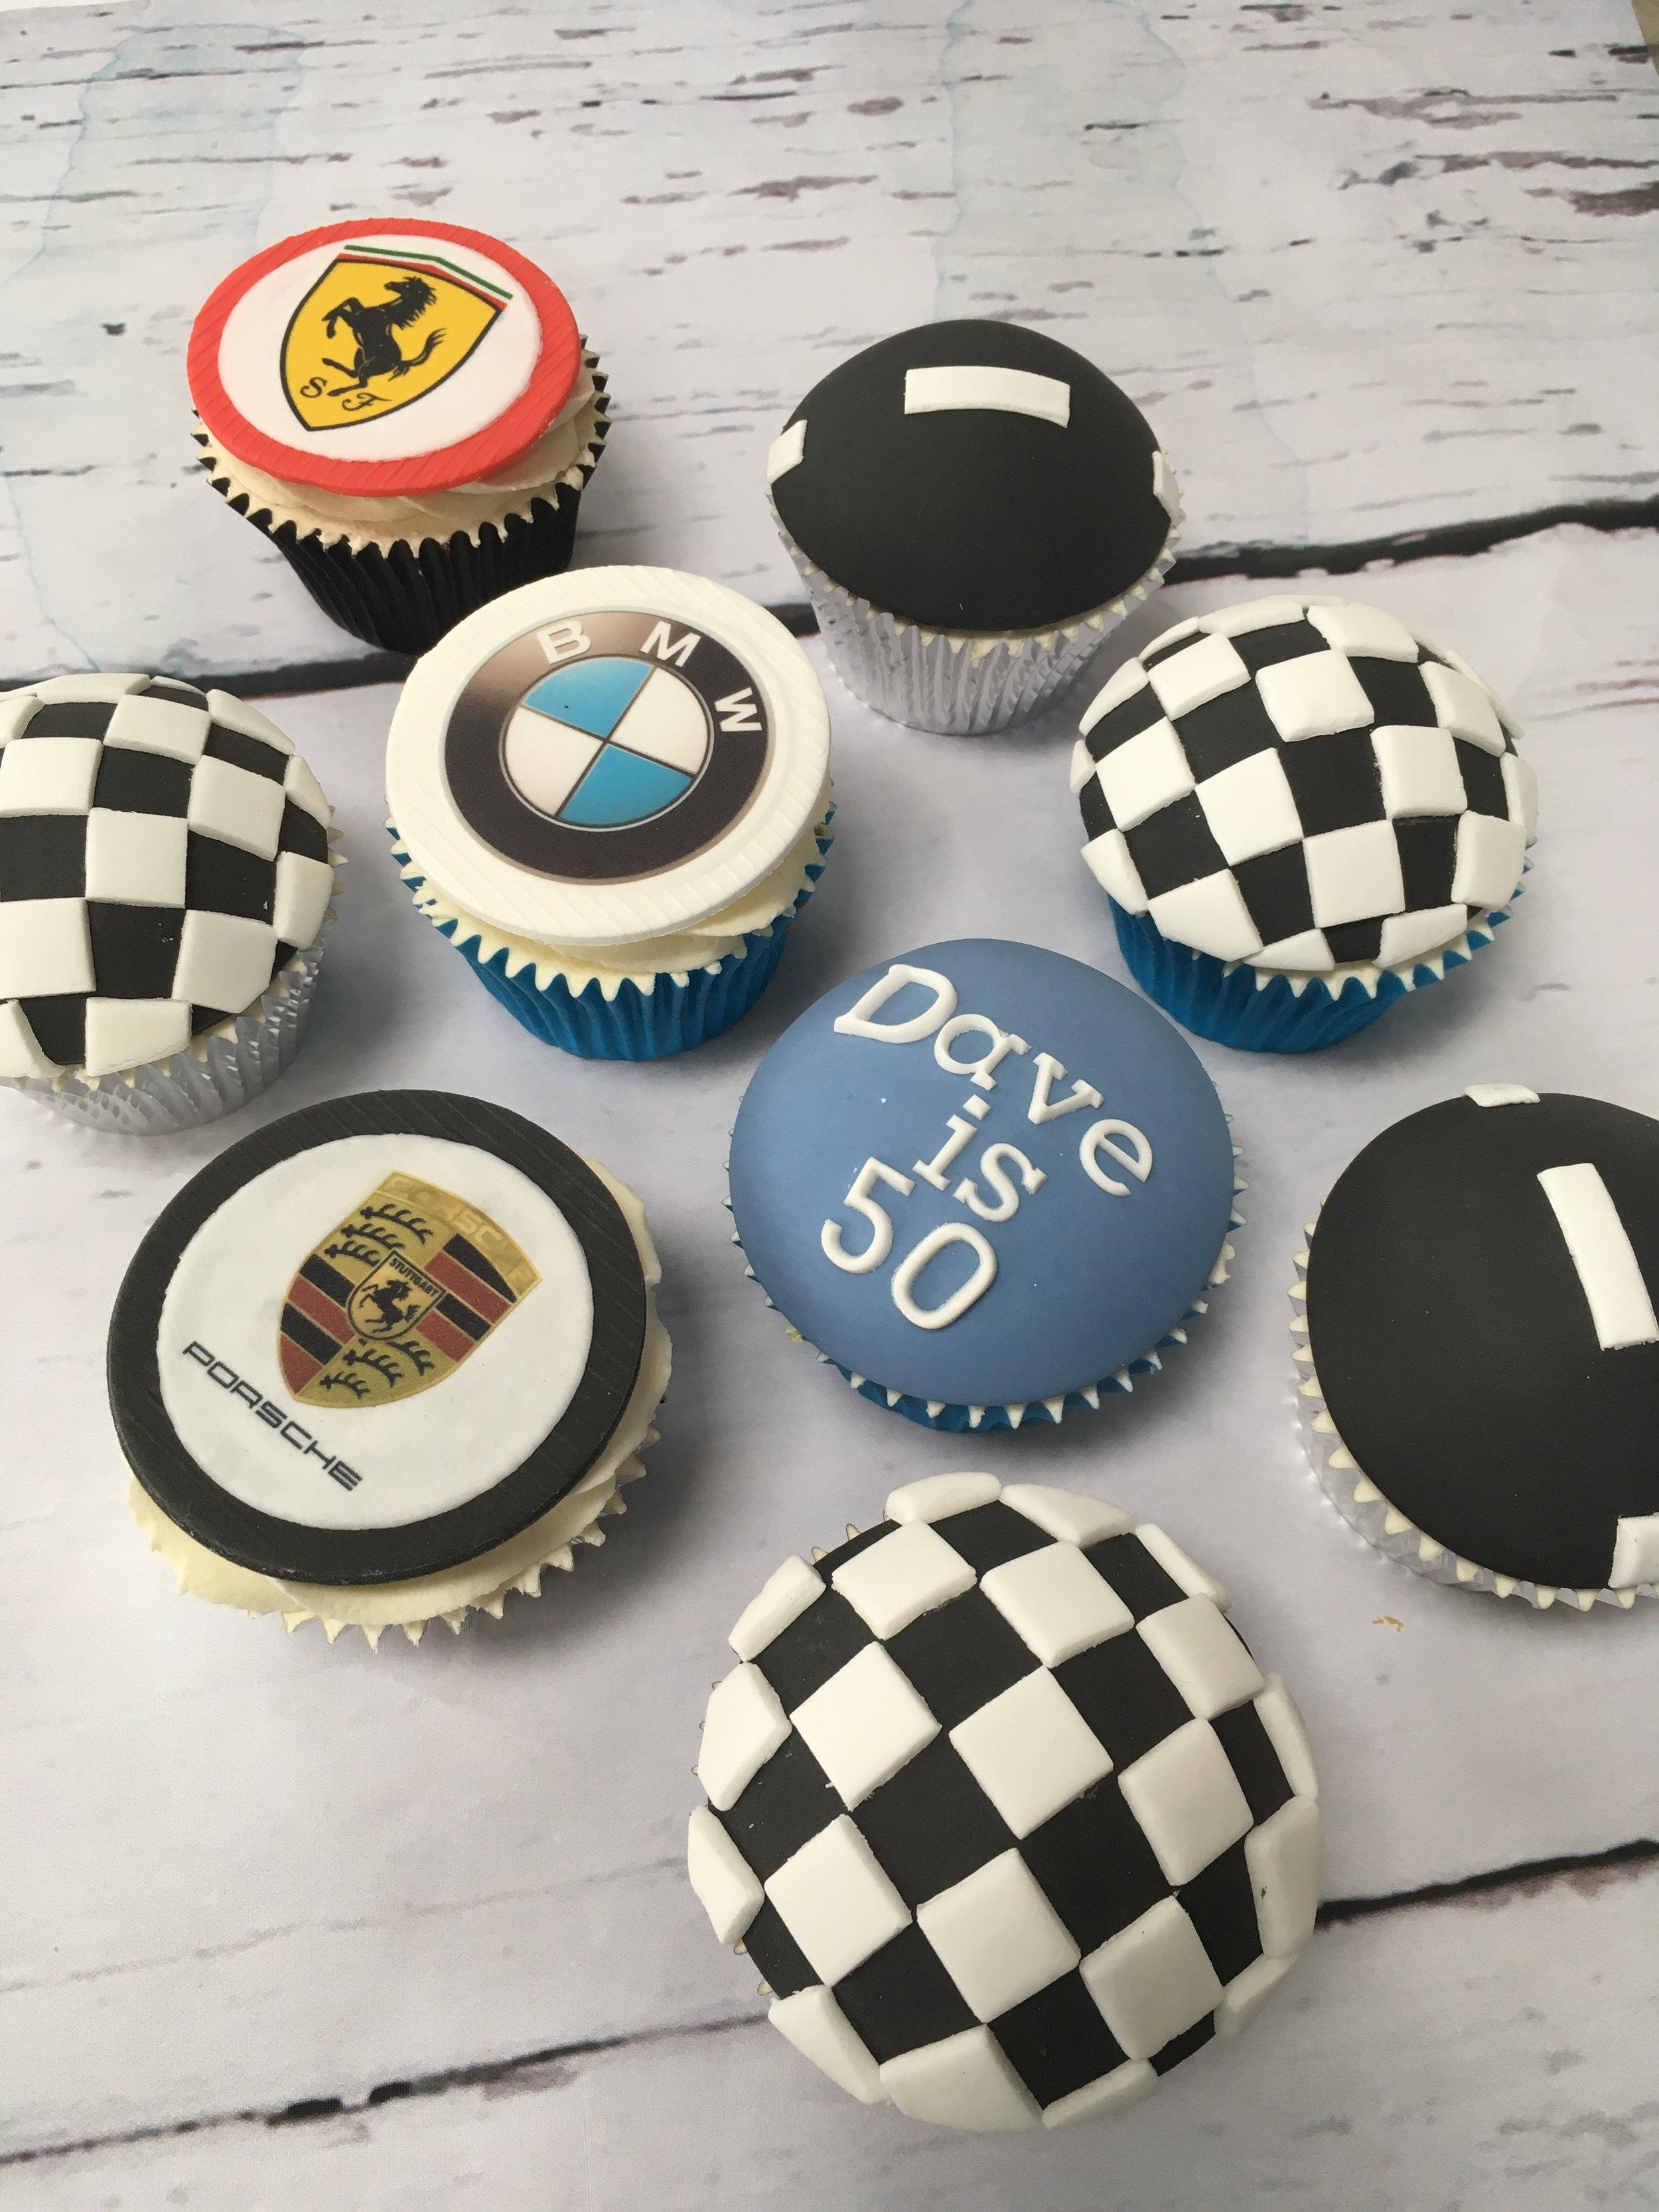 Supercar cupcakes